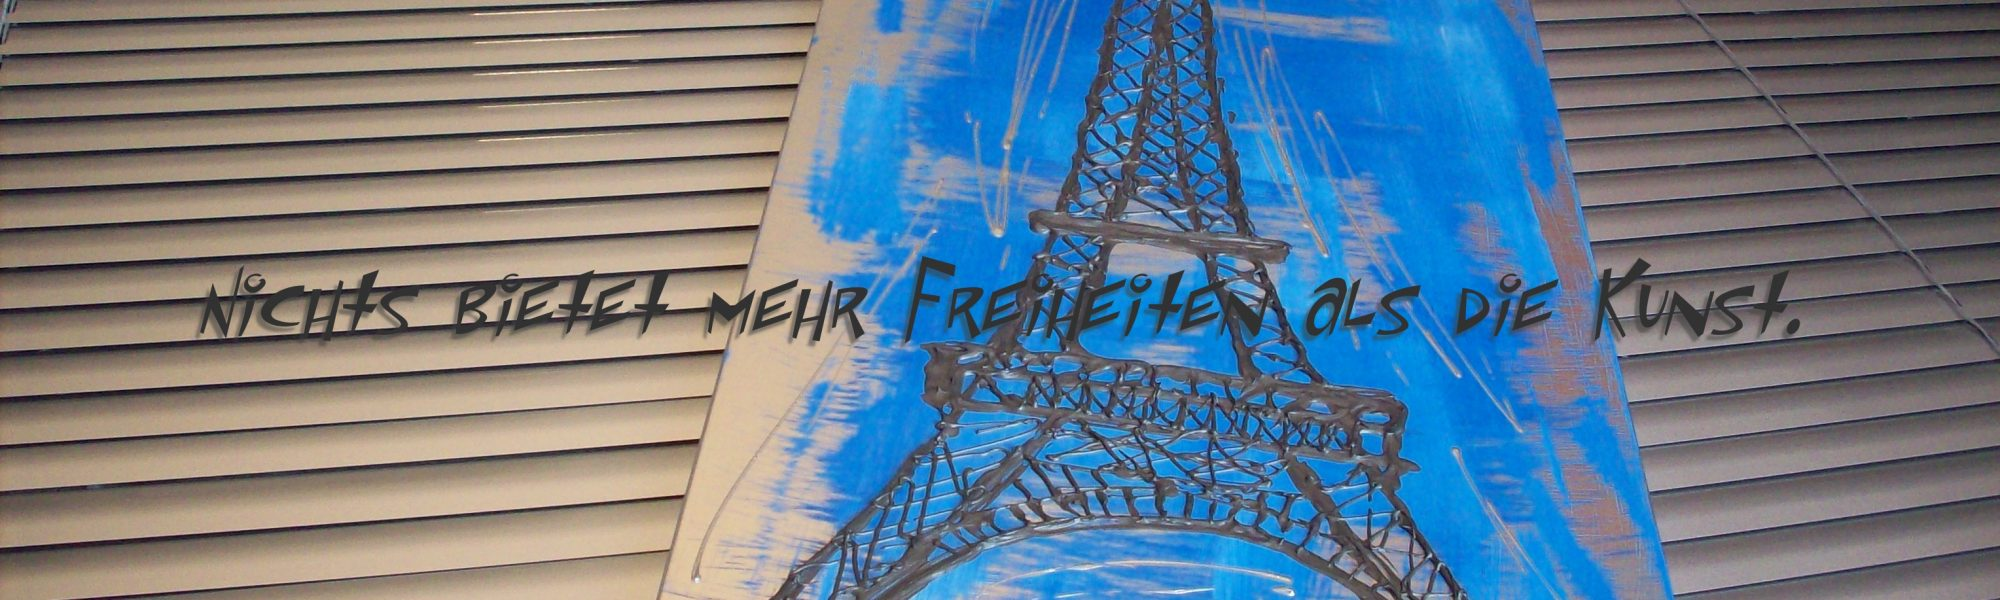 Slide Startseite Eiffelturm